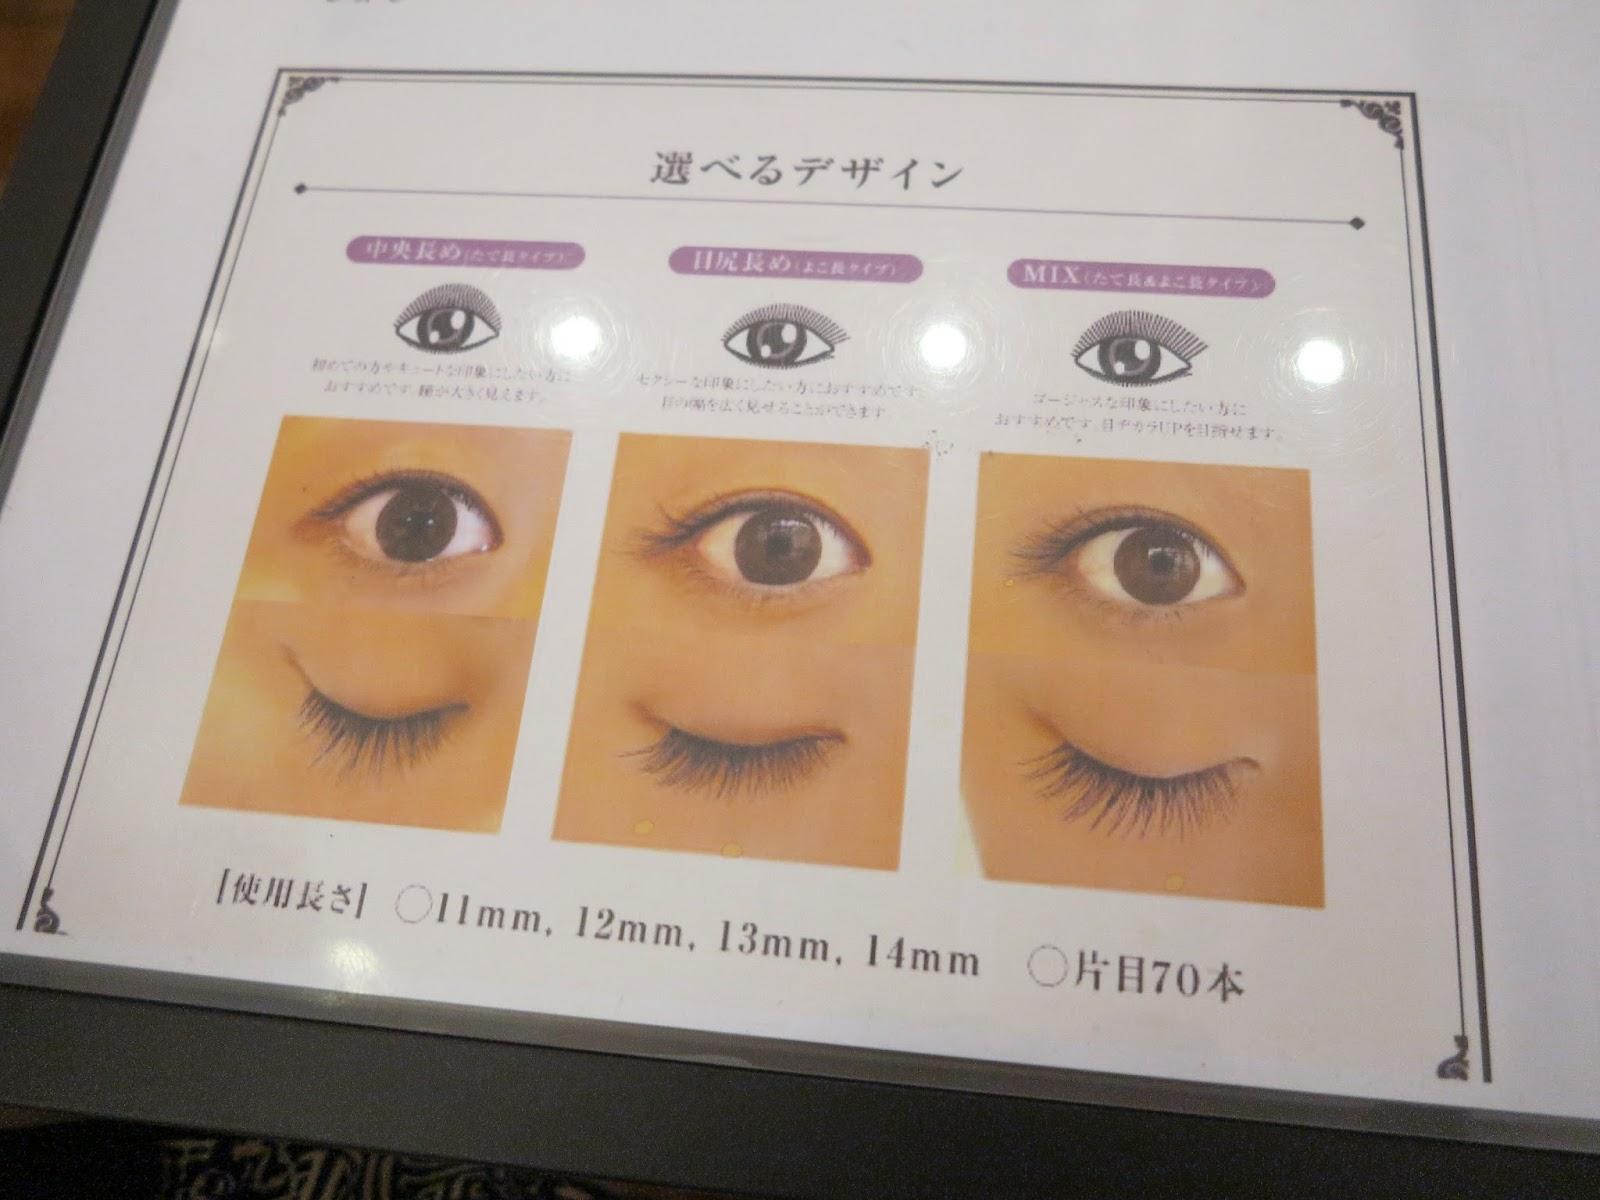 Japanese Eyelash Extensions at KJ Studio Review | Award-winning ...